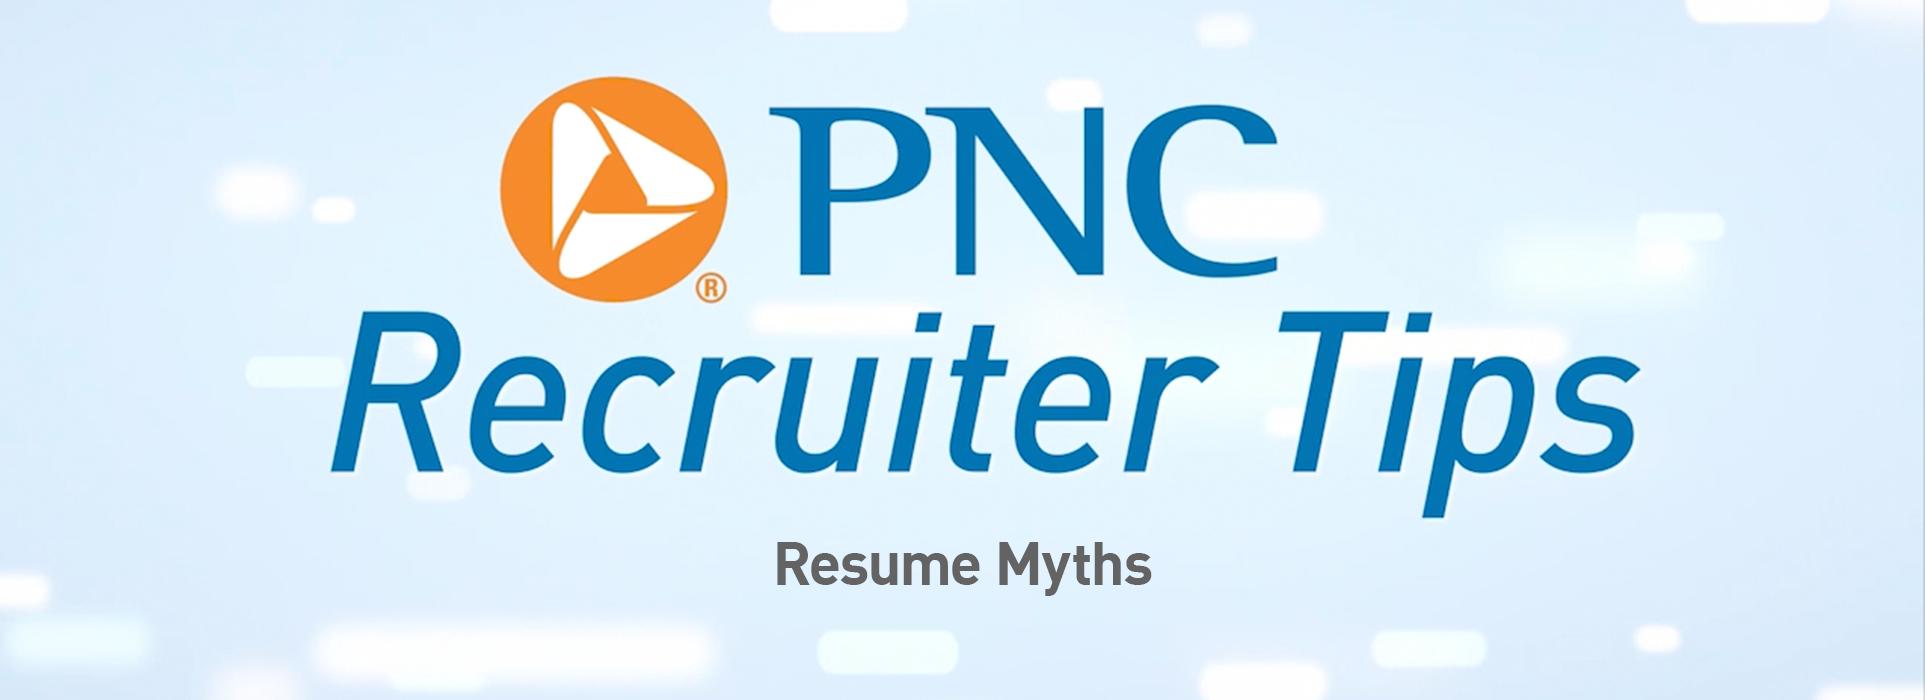 PNC Recruiter Tips: Resume Myths